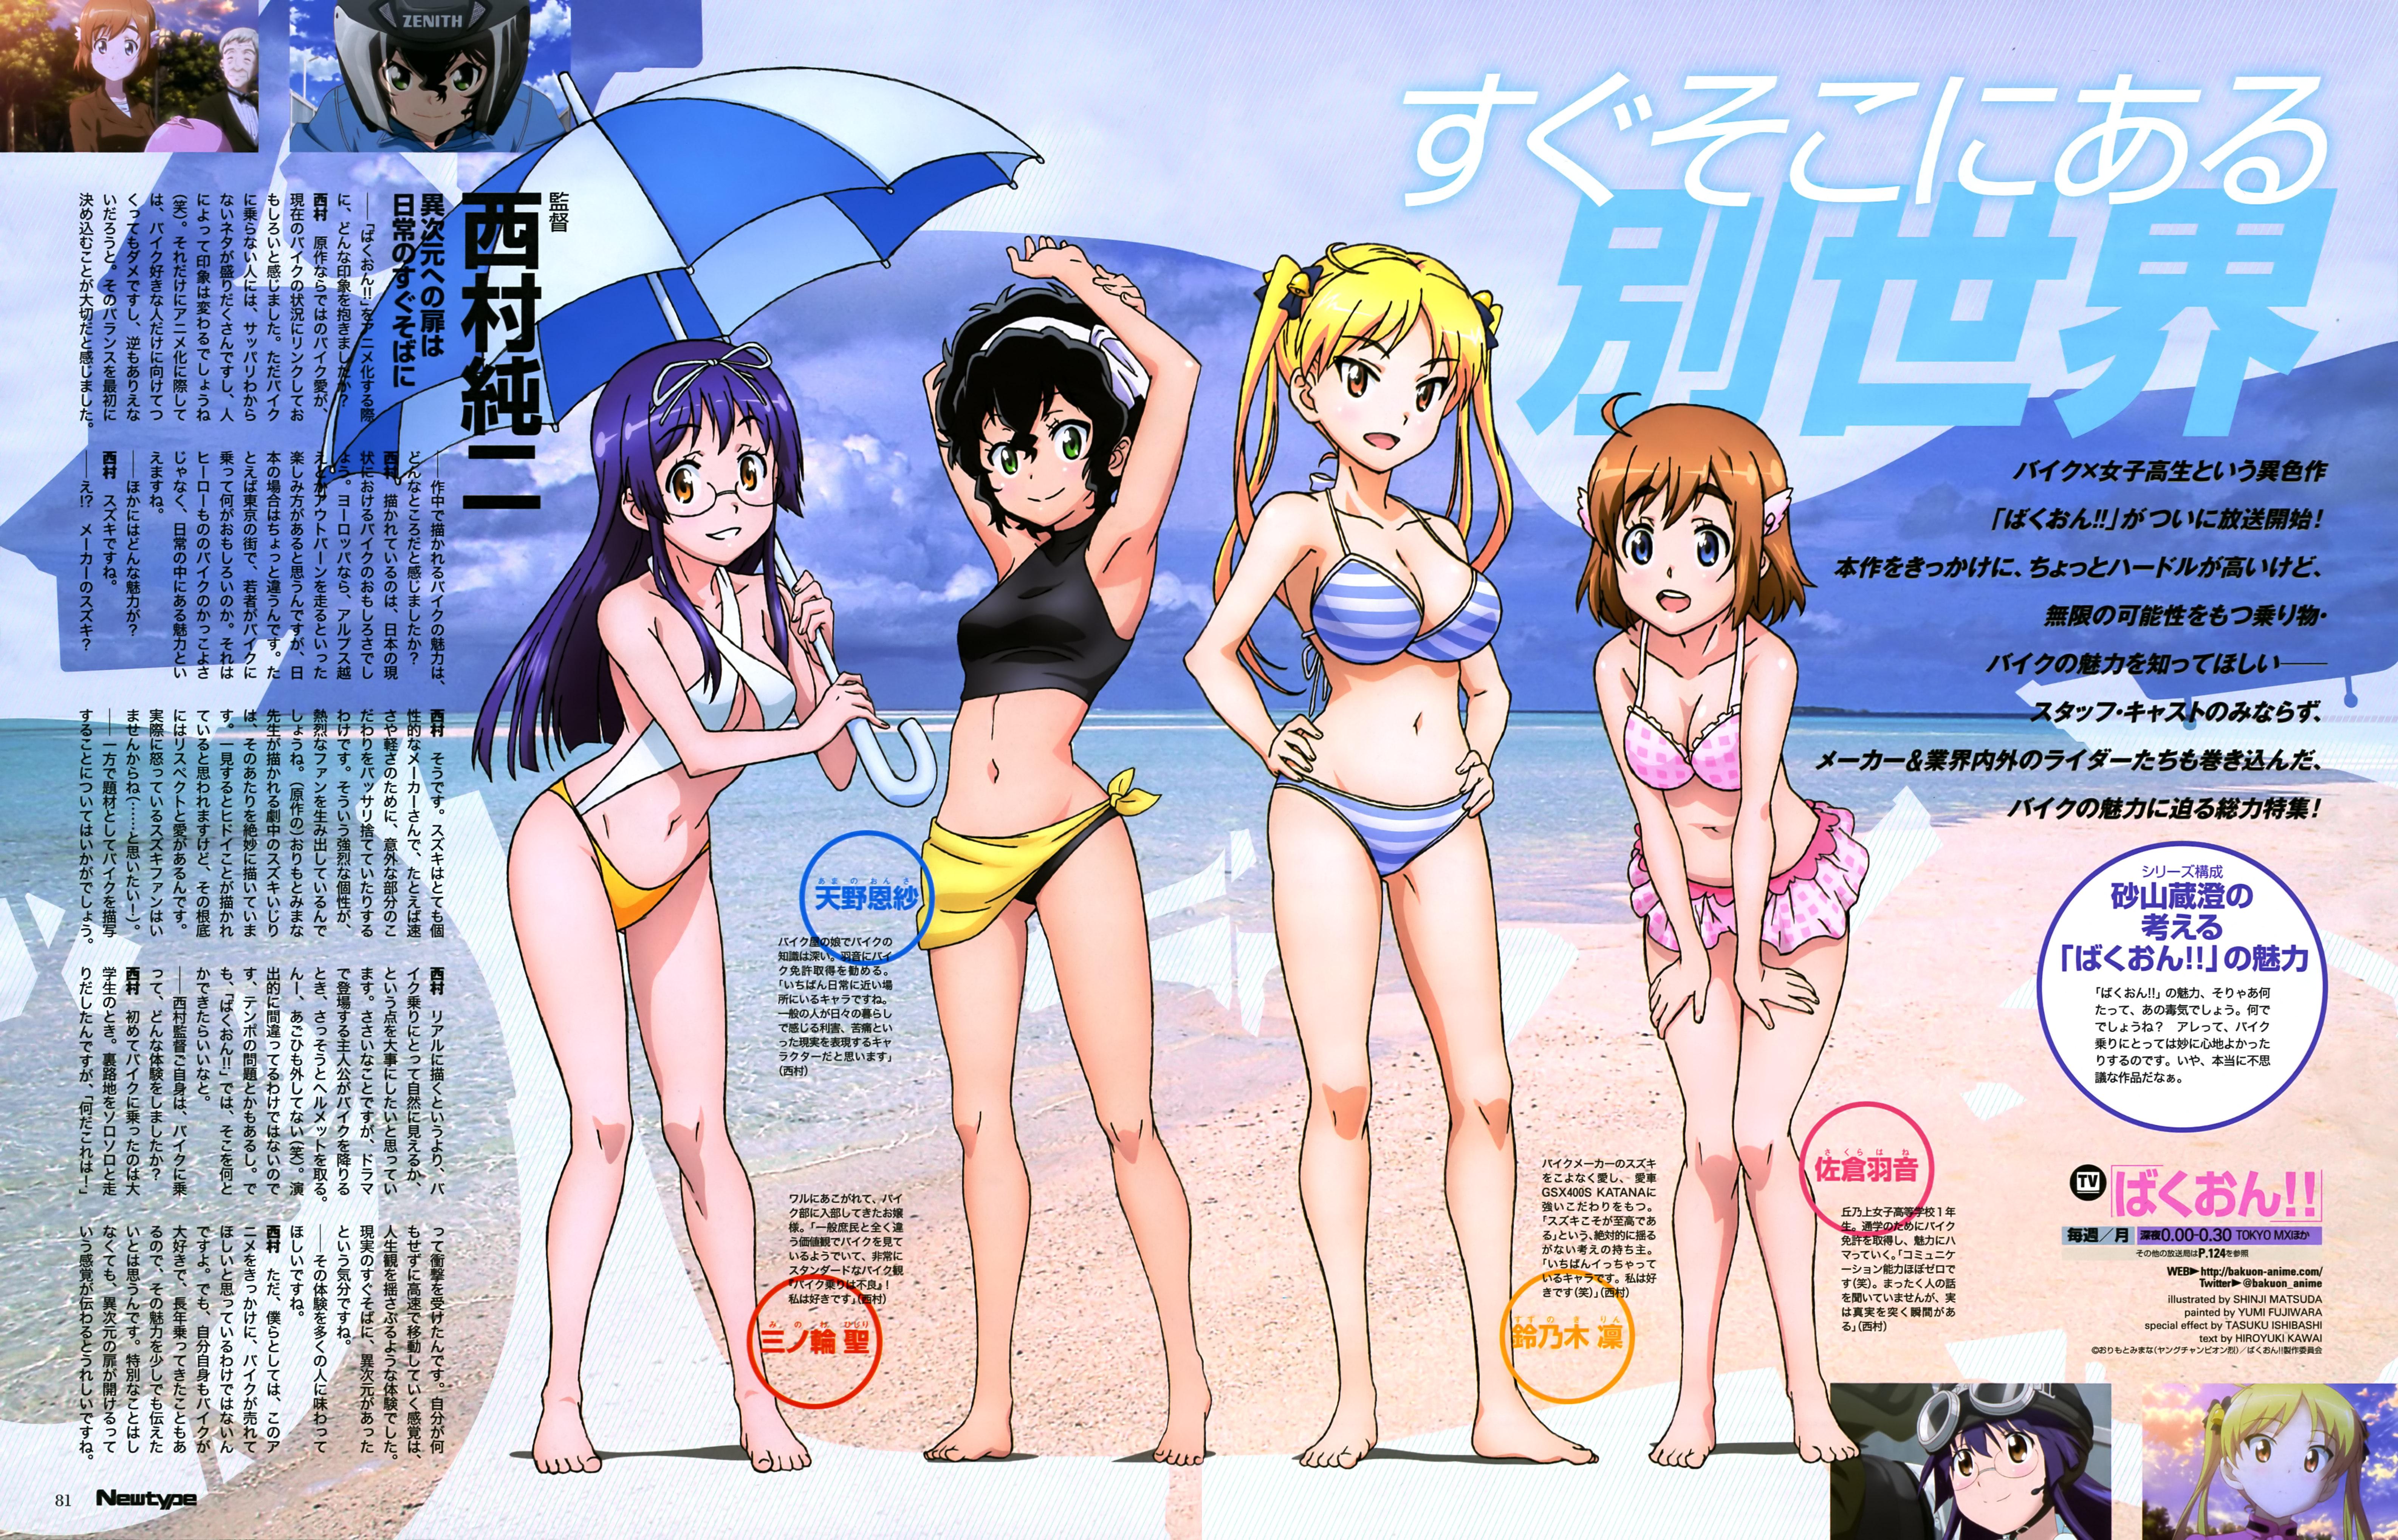 Bakuon!! Girls Prepare for the Beach in New Visual